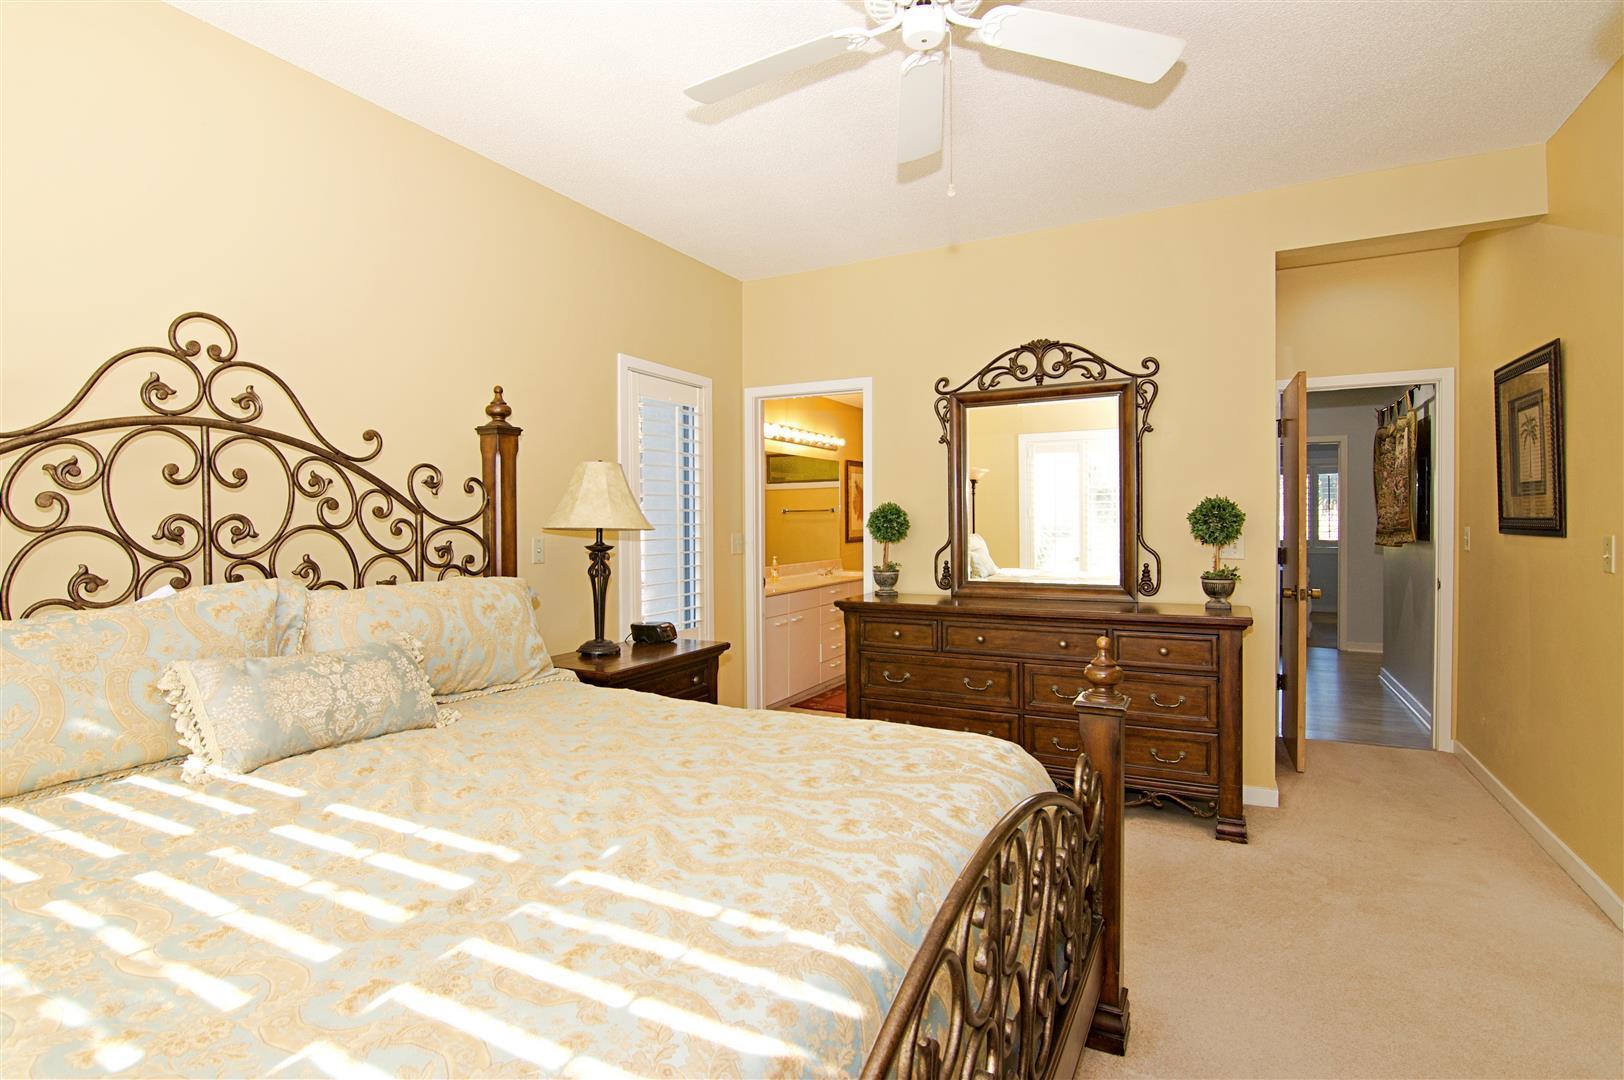 Seabrook Island Homes For Sale - 3020 Ocean Winds, Seabrook Island, SC - 29